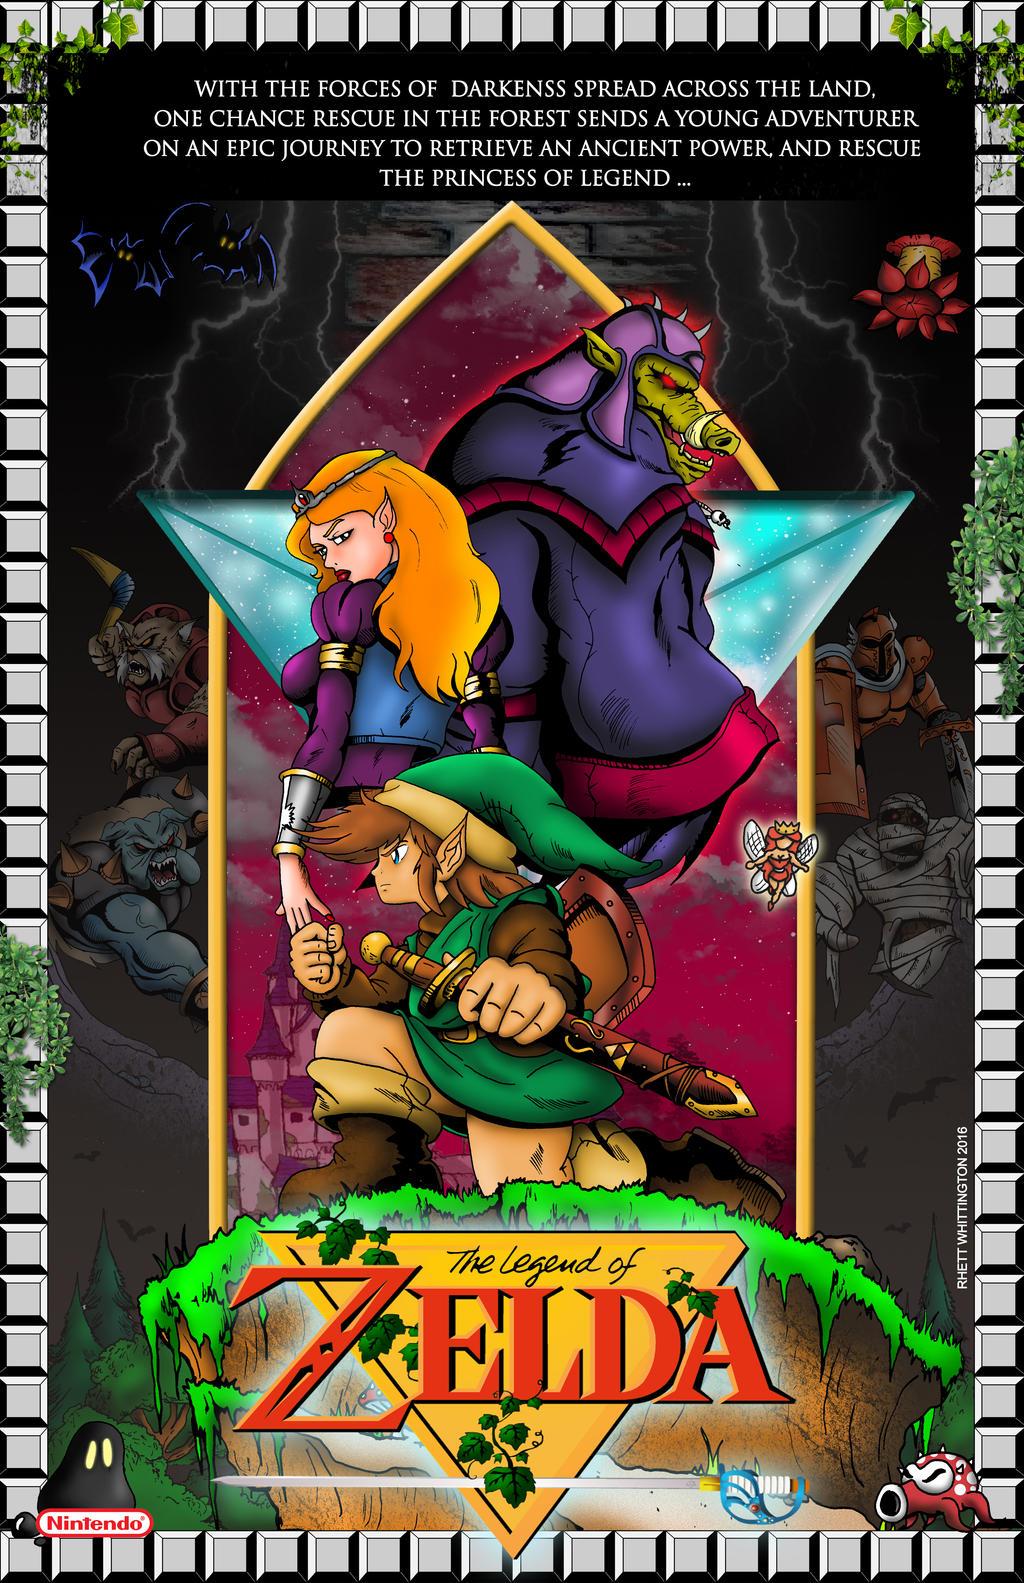 legend of zelda nes poster by whittingtonrhett on deviantart nintendo nes service manual nintendo nes manual pdf